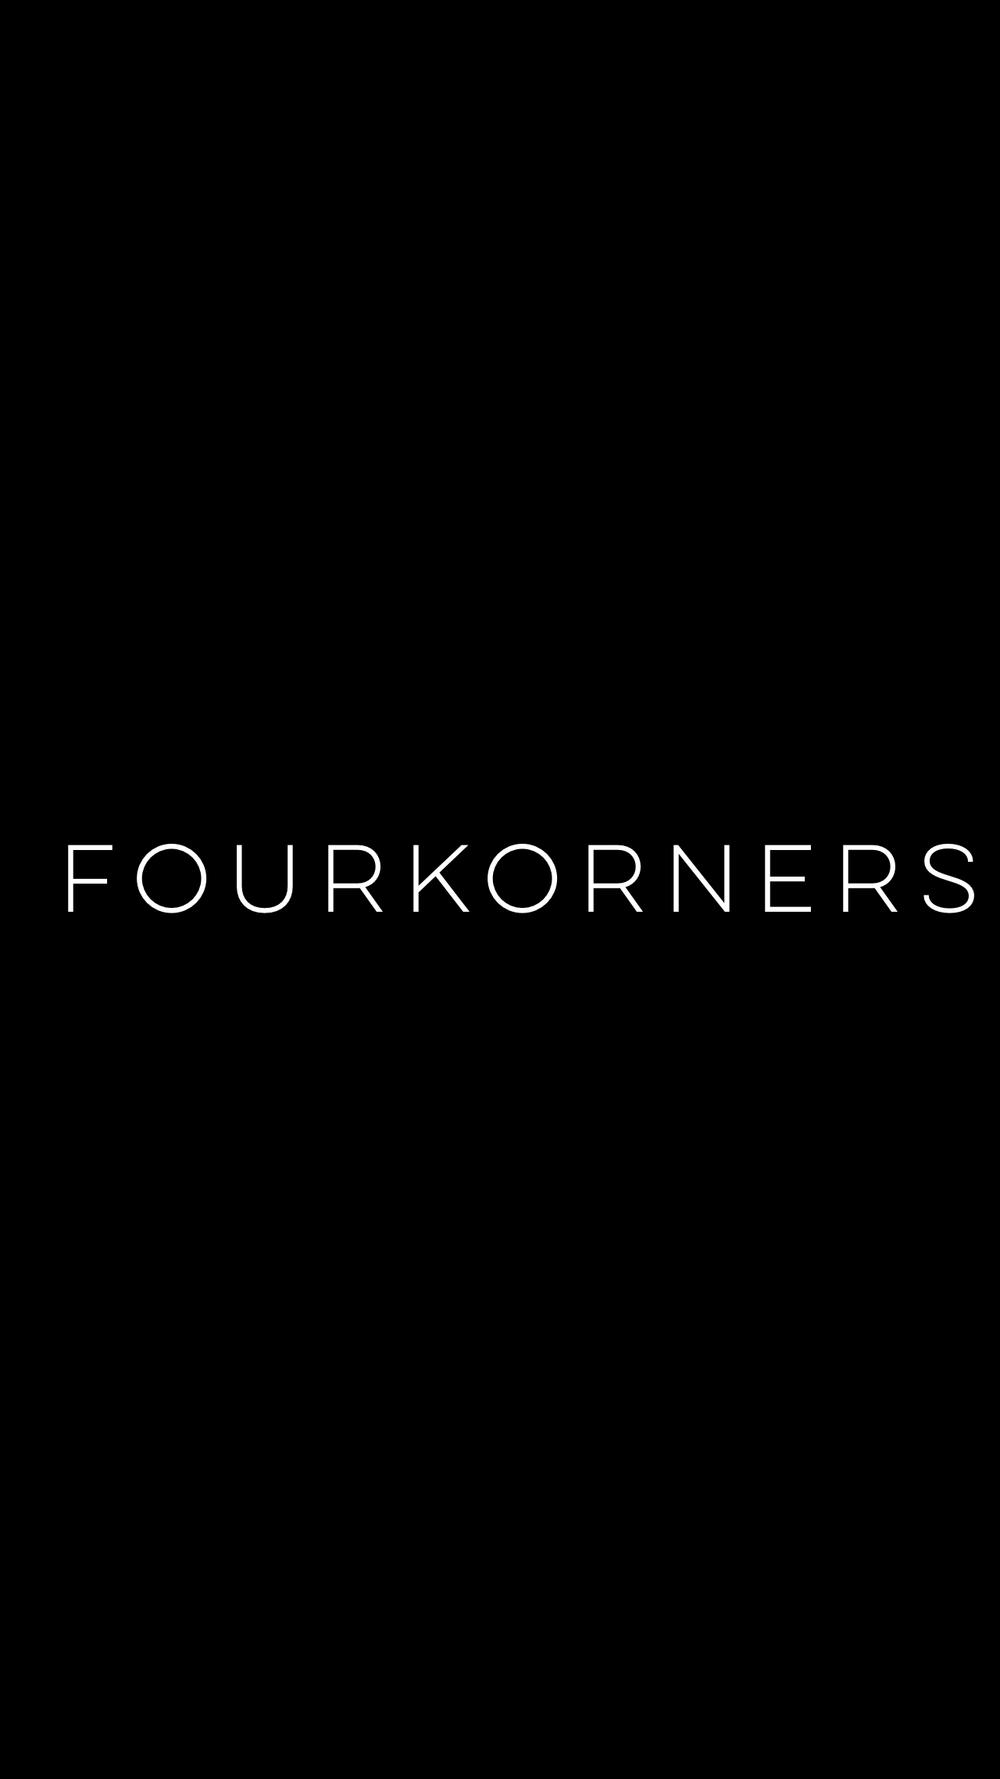 FOURKORNERS.jpg